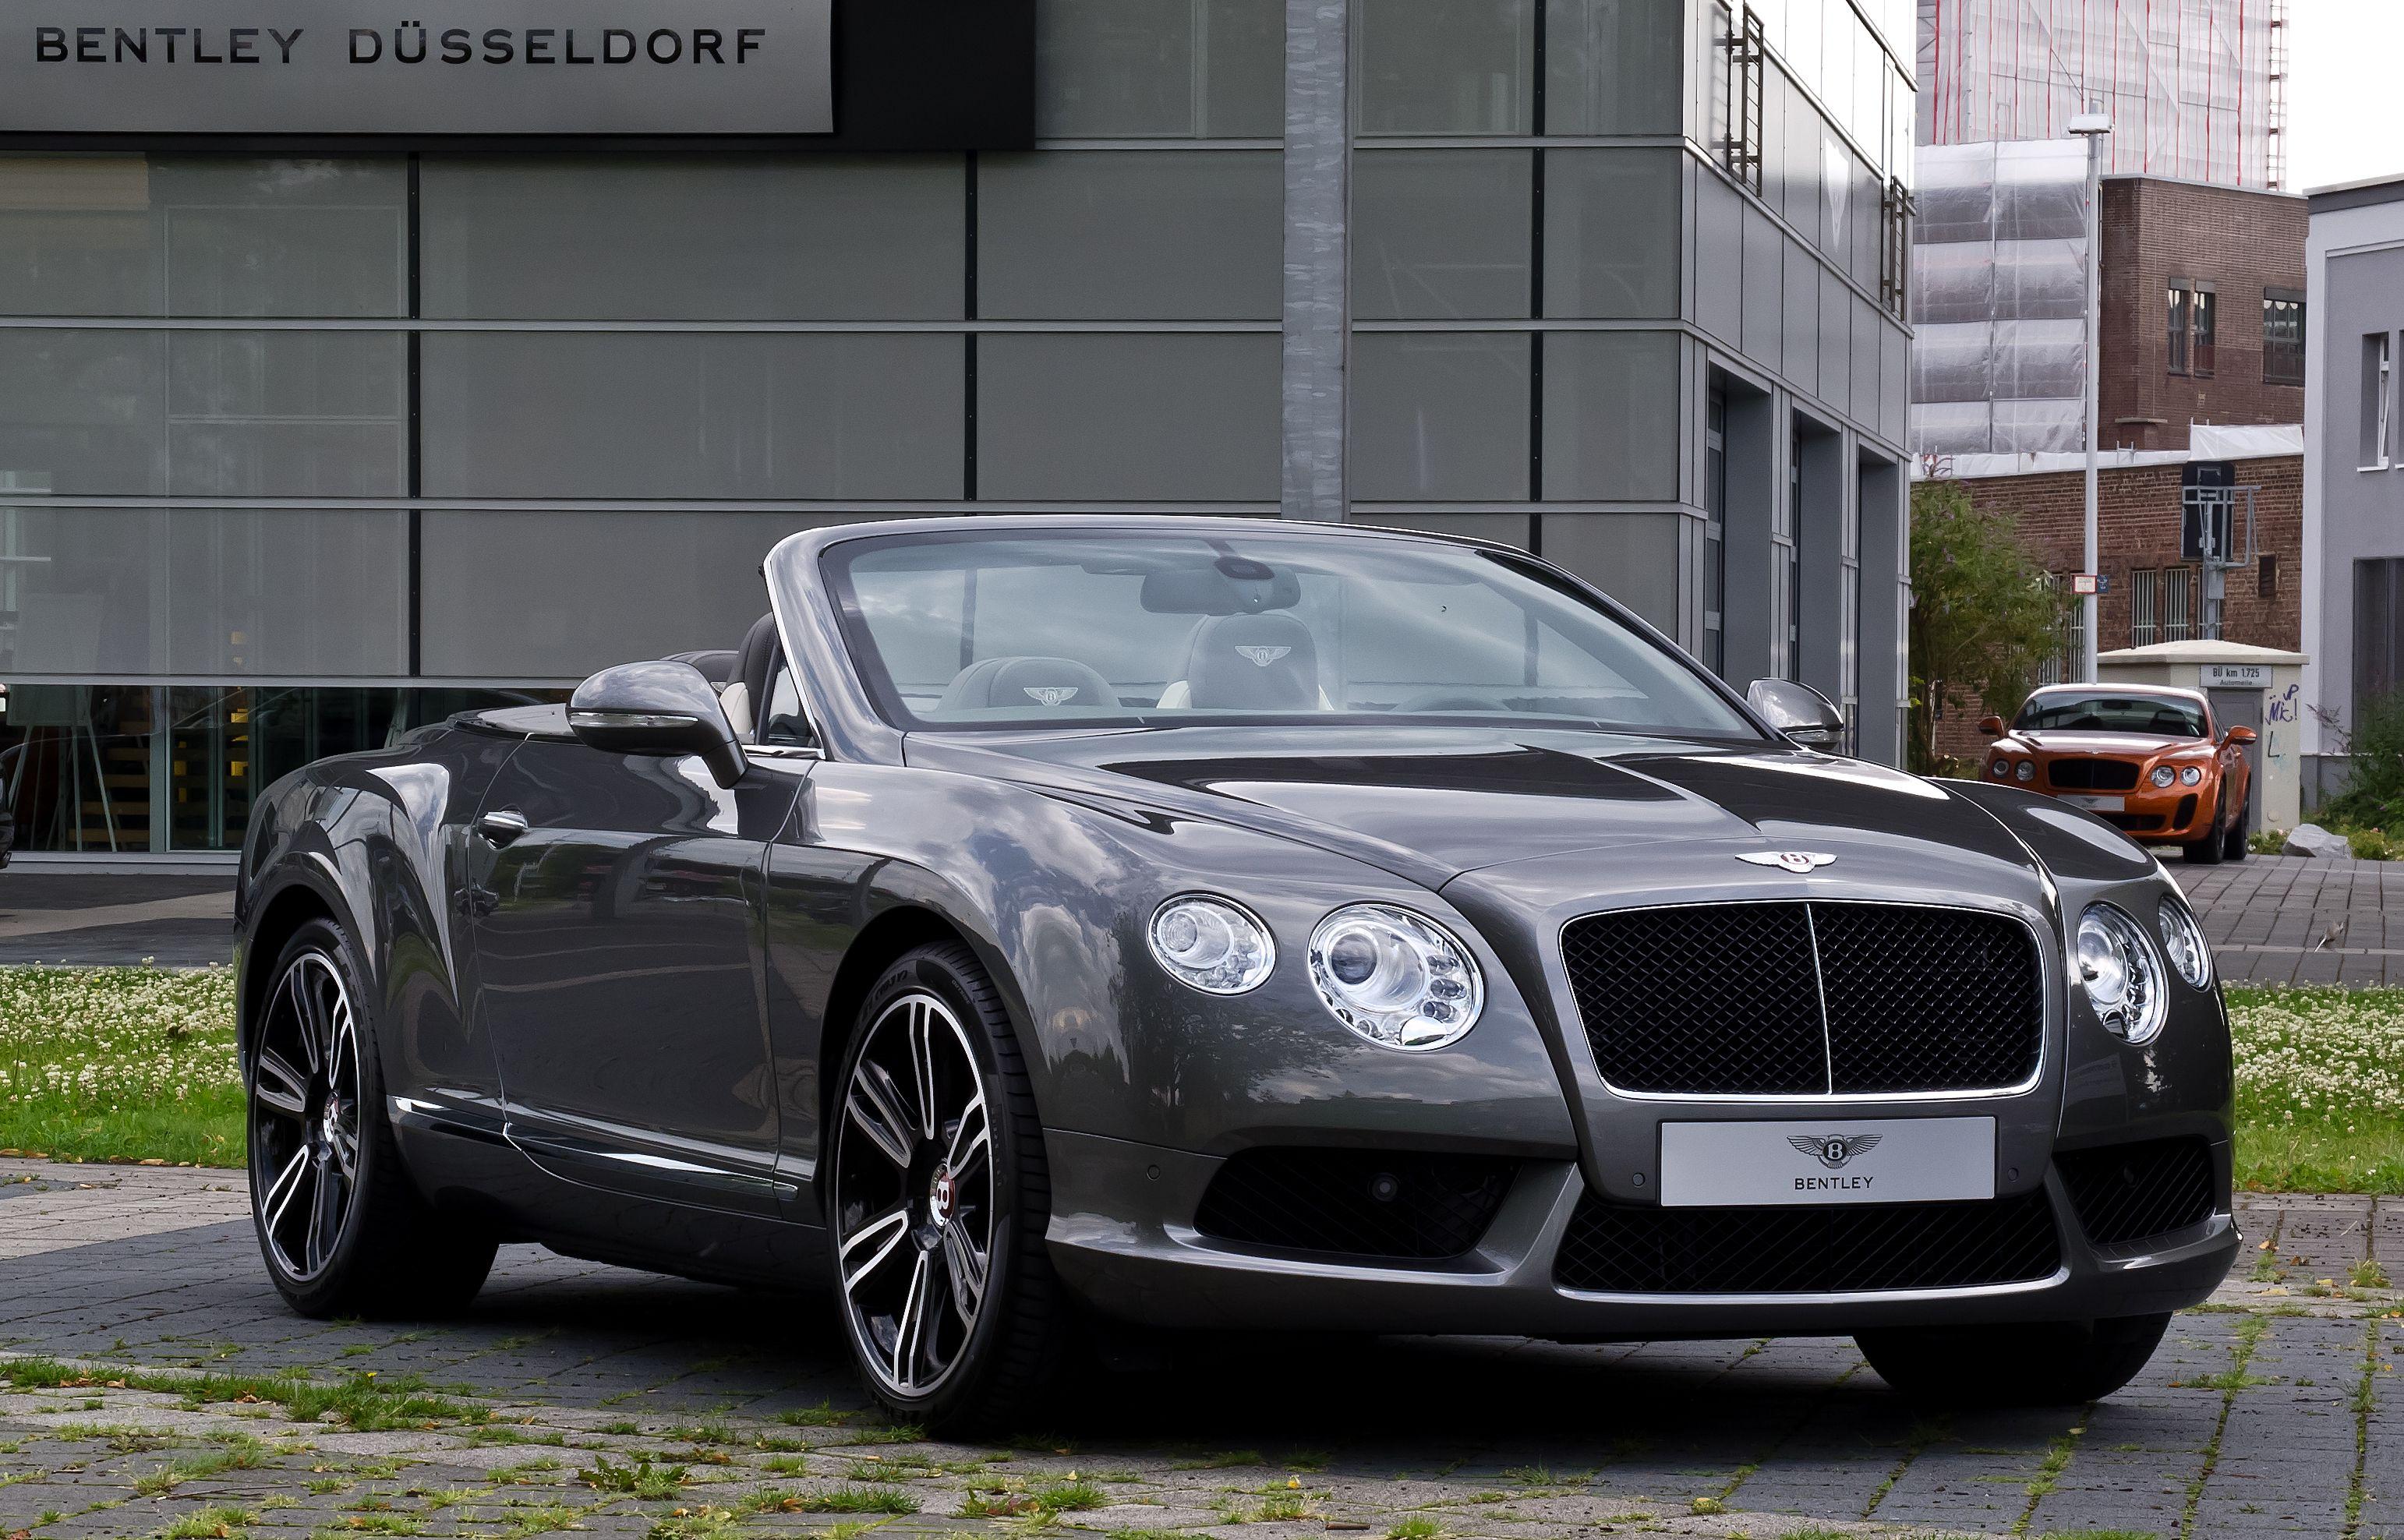 ext bentley continental bgtc m o r cars gt com range a y en mansory sale for n s speed gtc